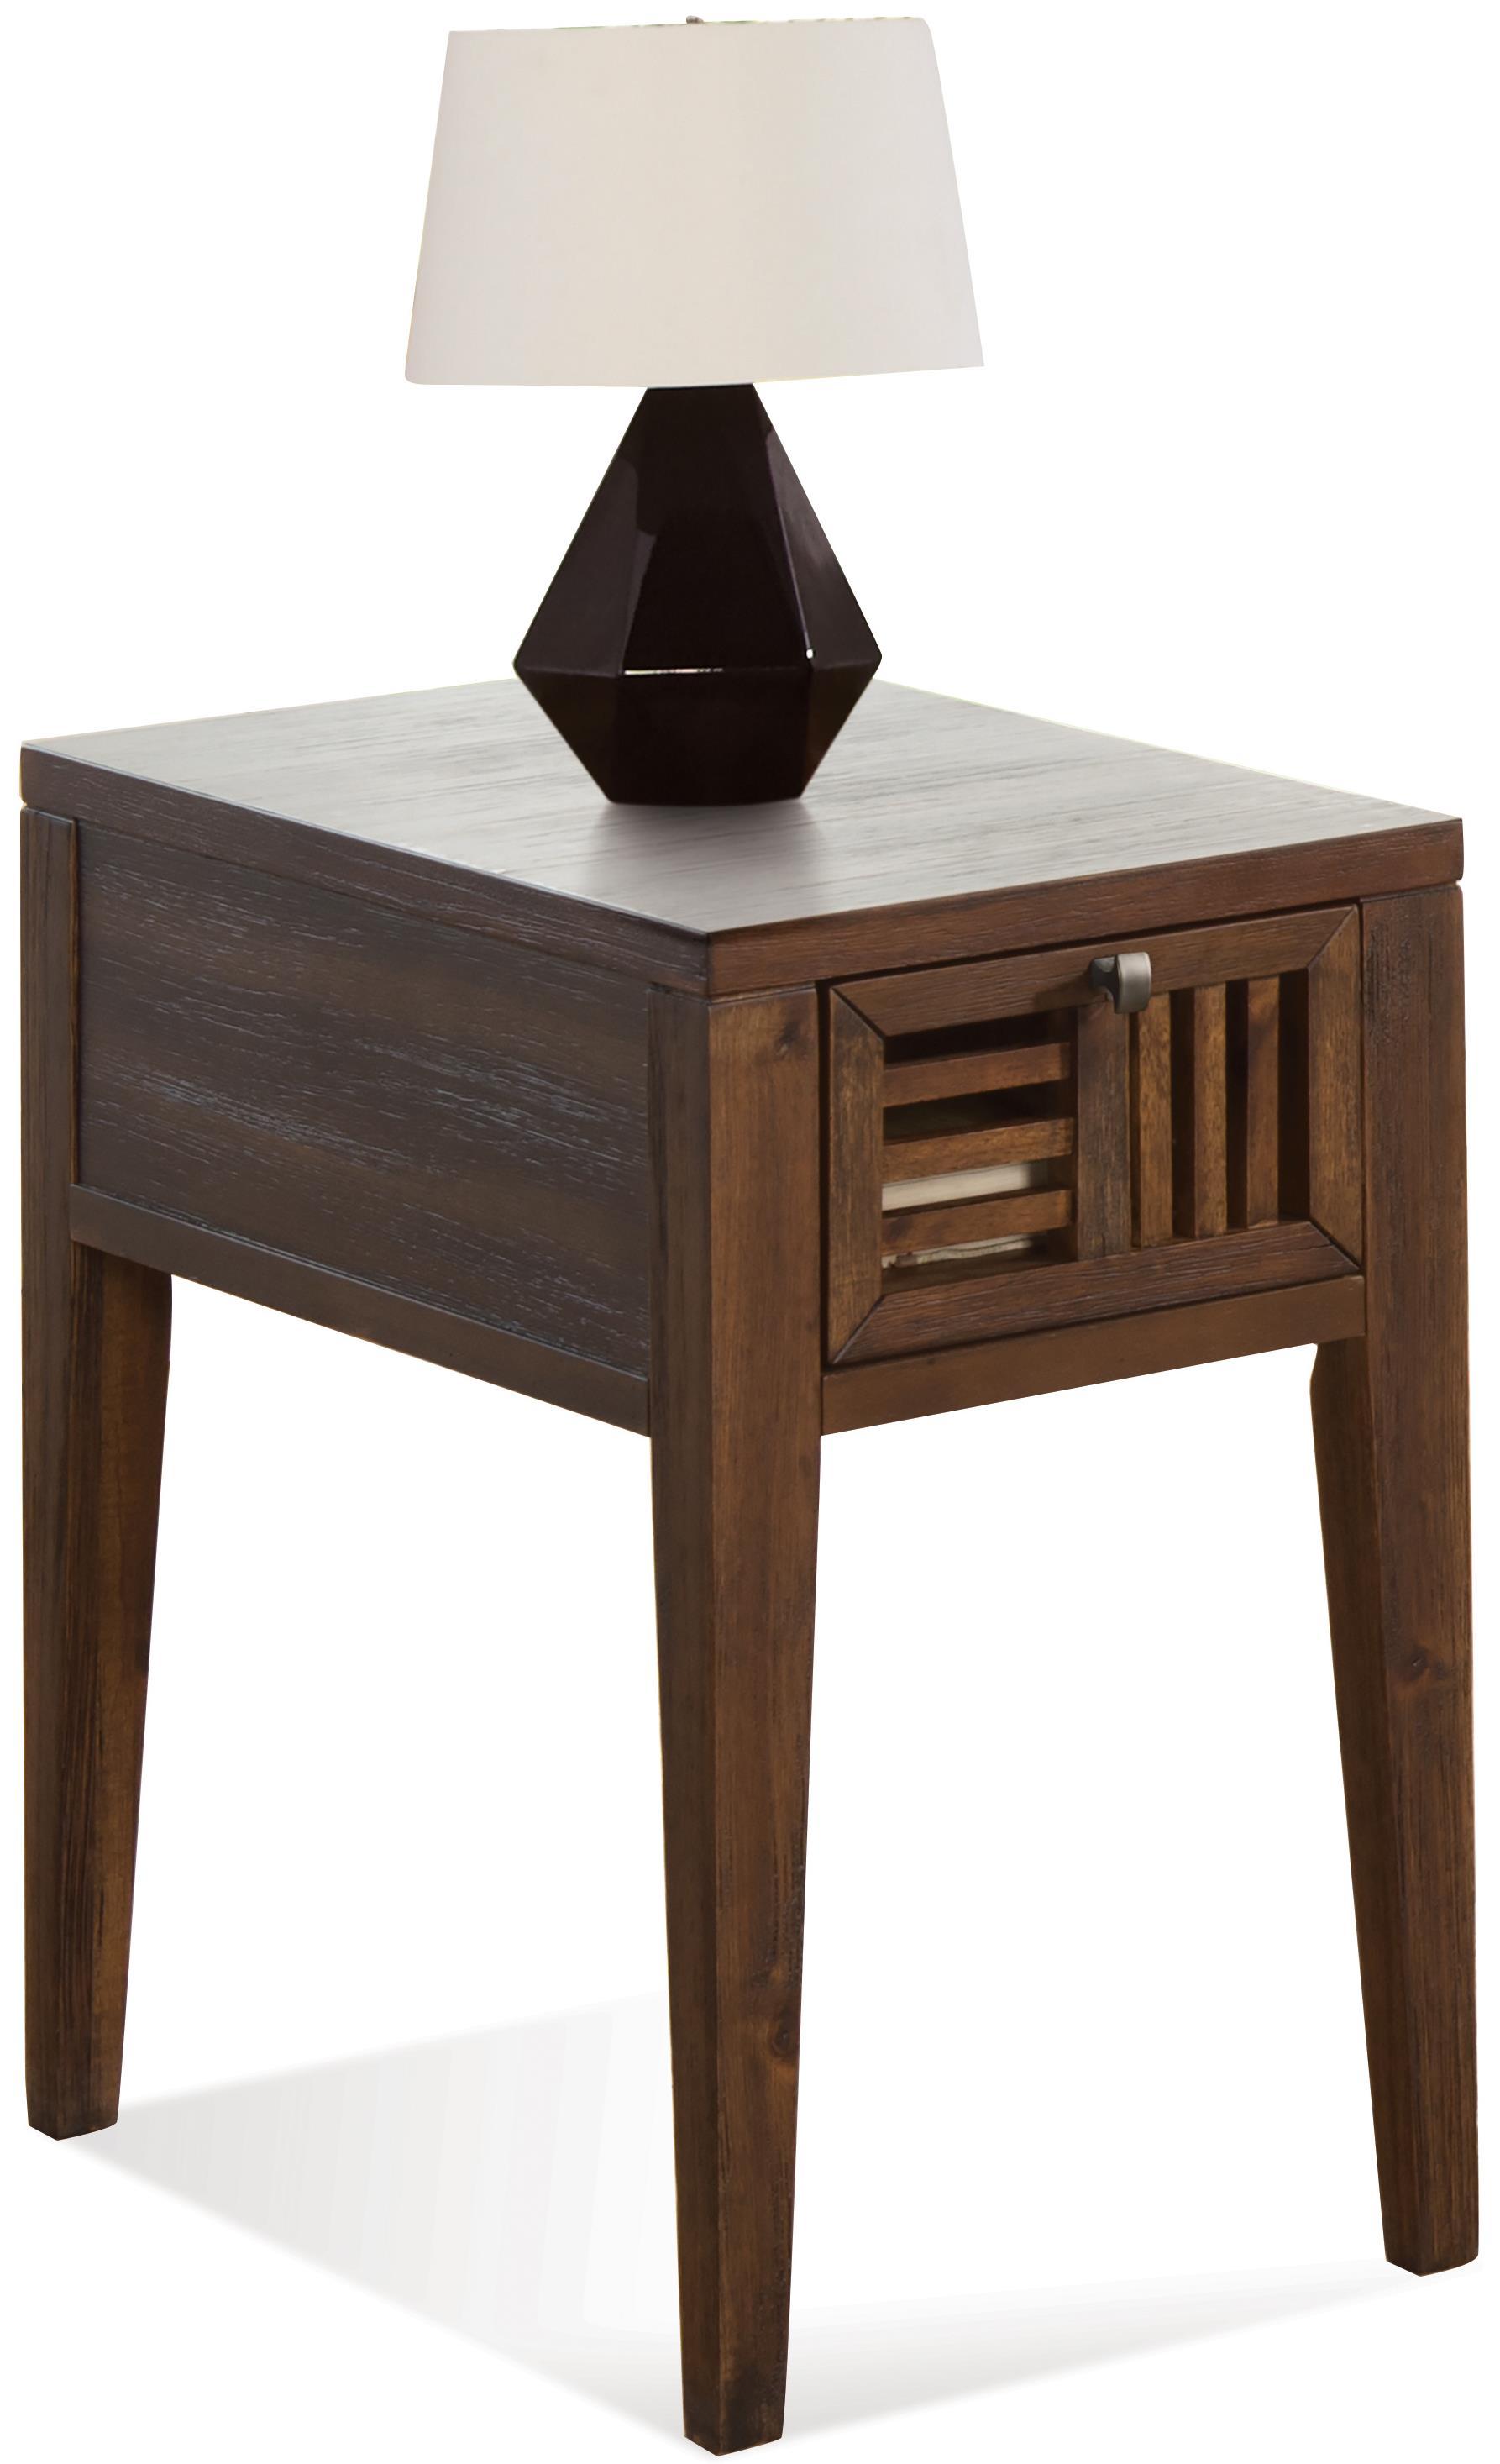 Riverside Furniture Modern Gatherings Open Slat Chairside Table - Item Number: 15311